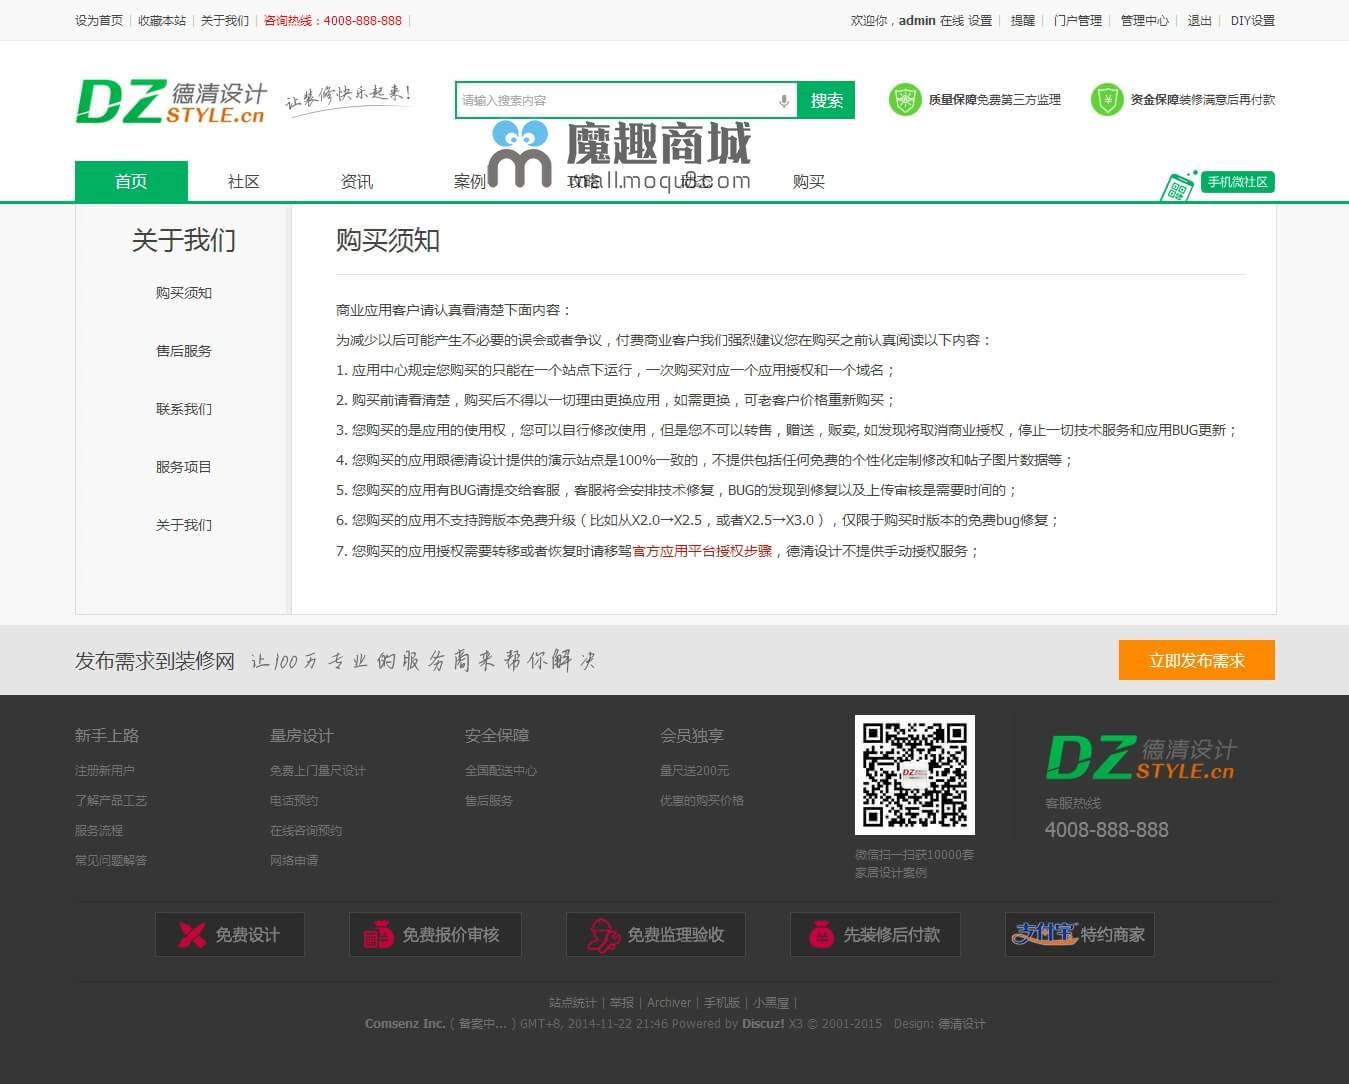 DZ绿色大气装修设计企业展示模板GBK+UTF8